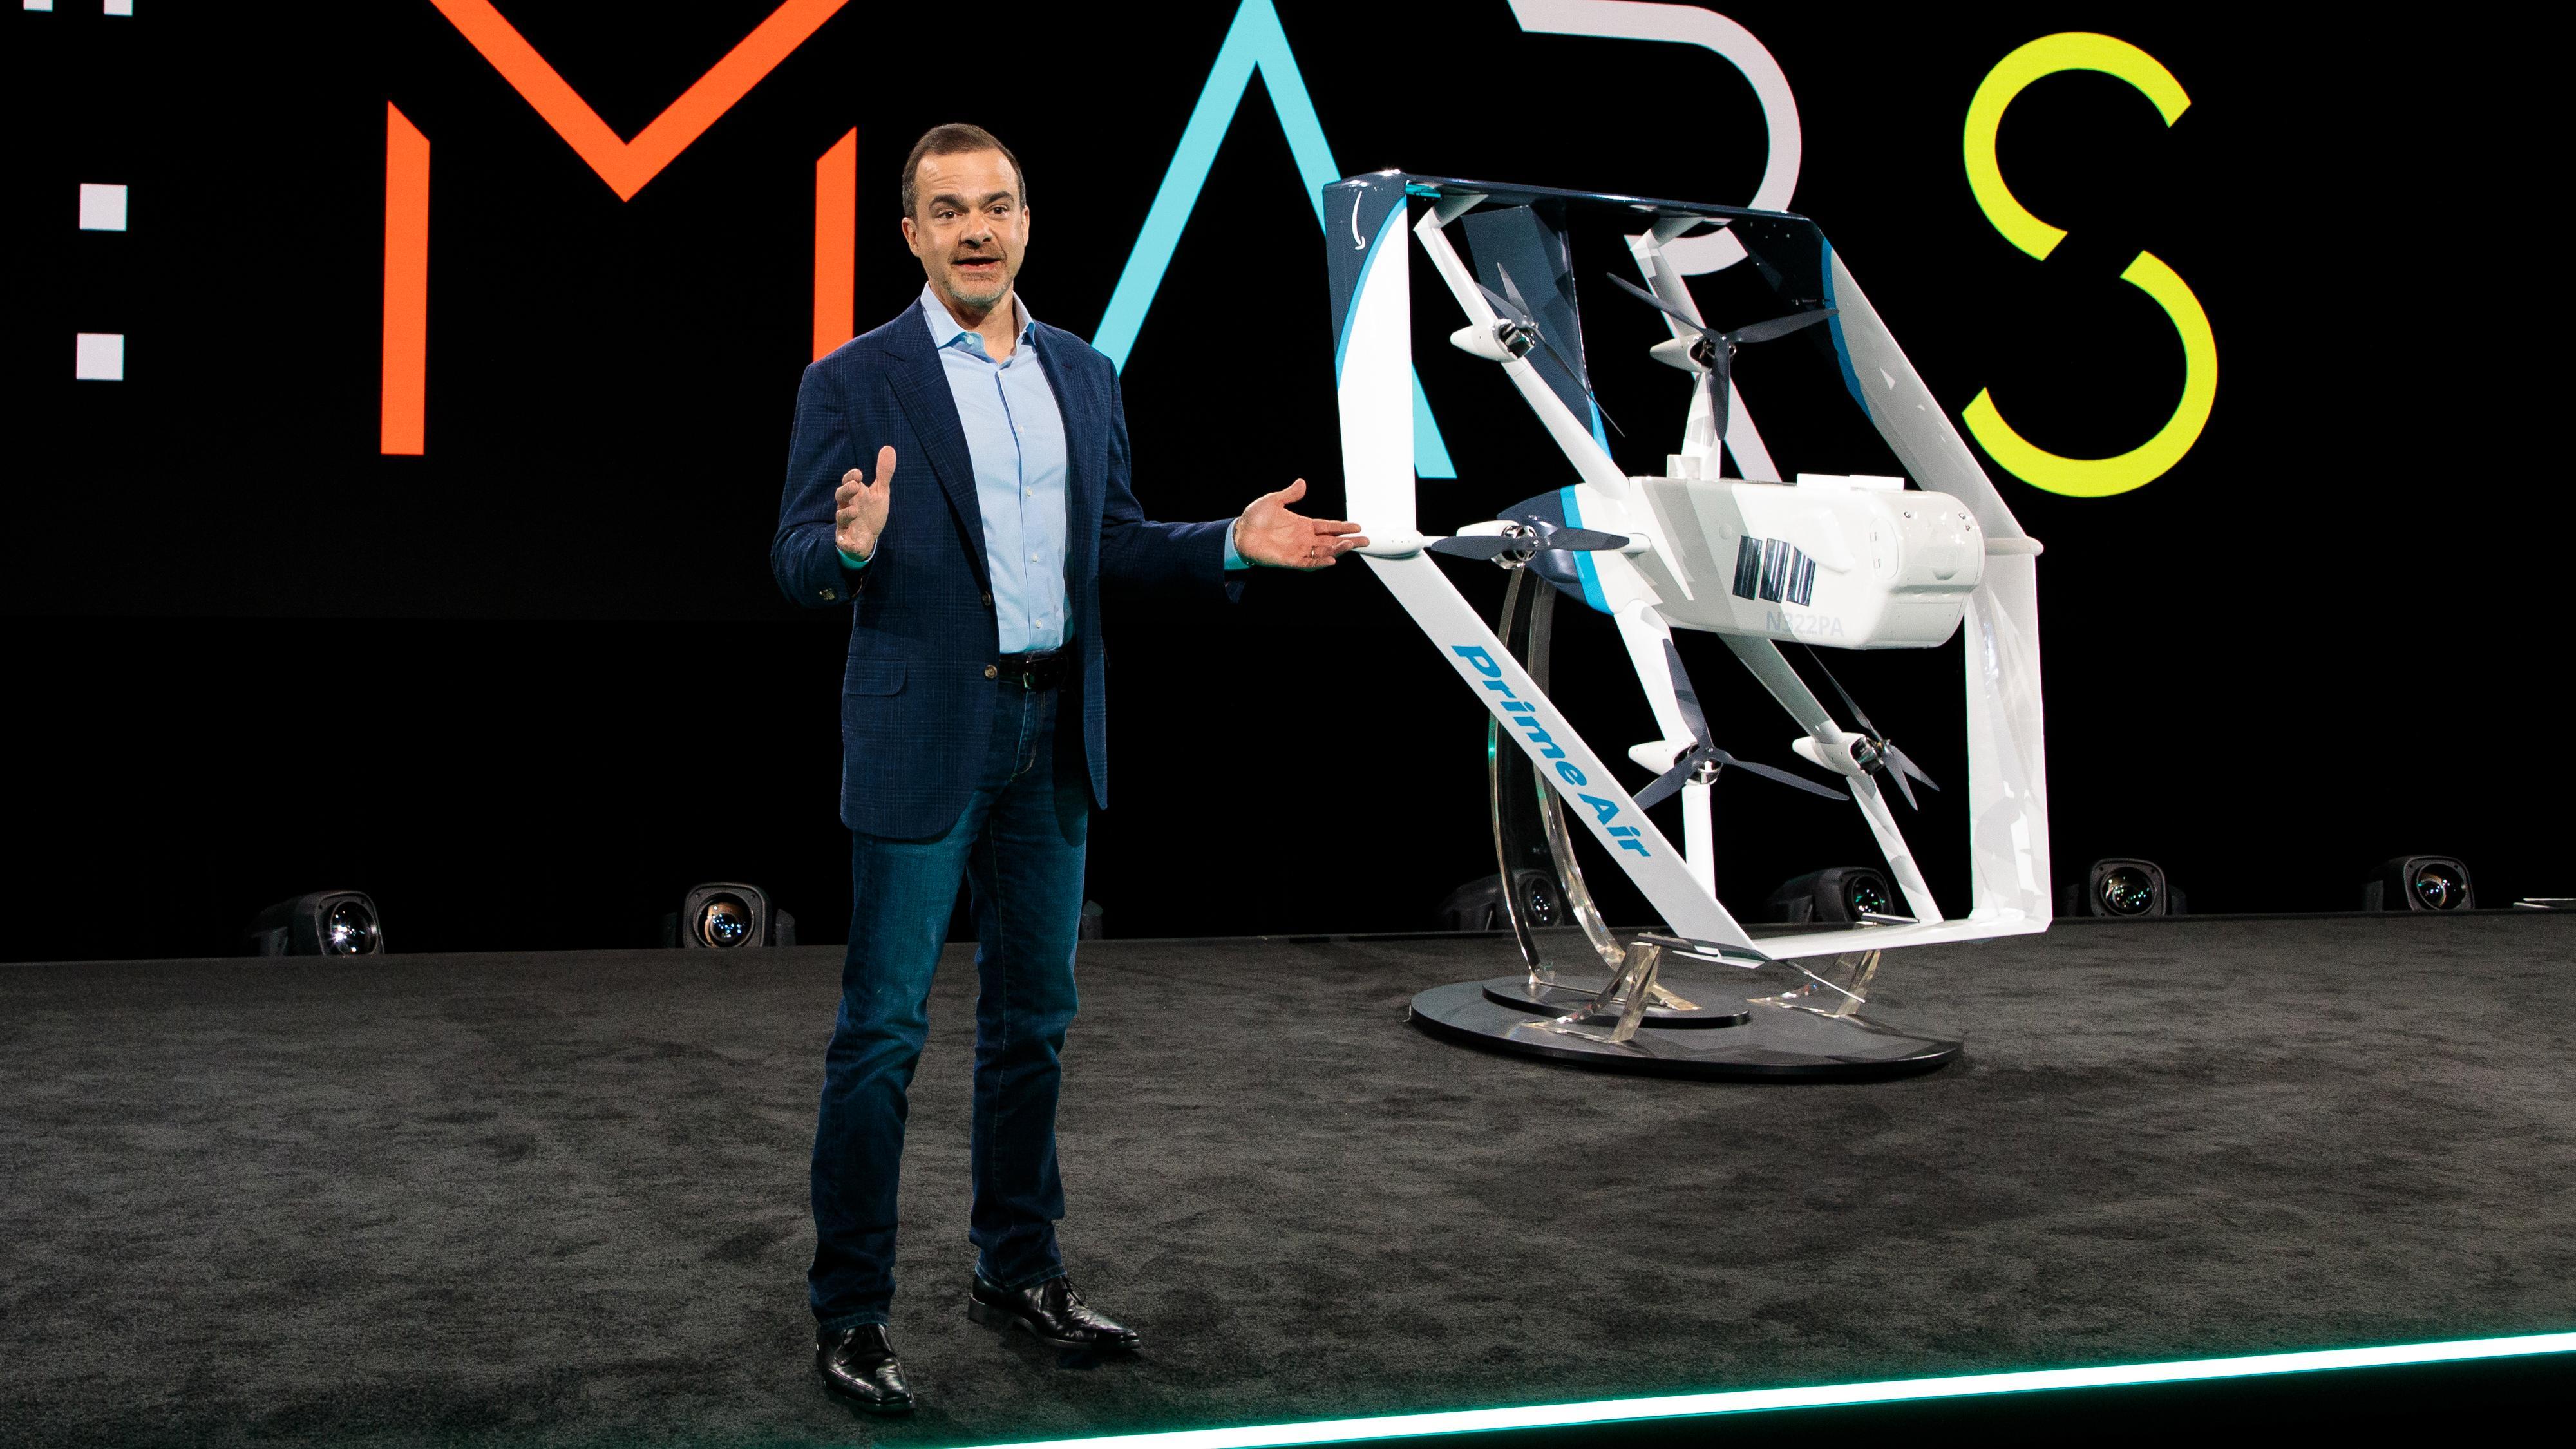 Kun «måneder unna» dronelevering, mener Amazon